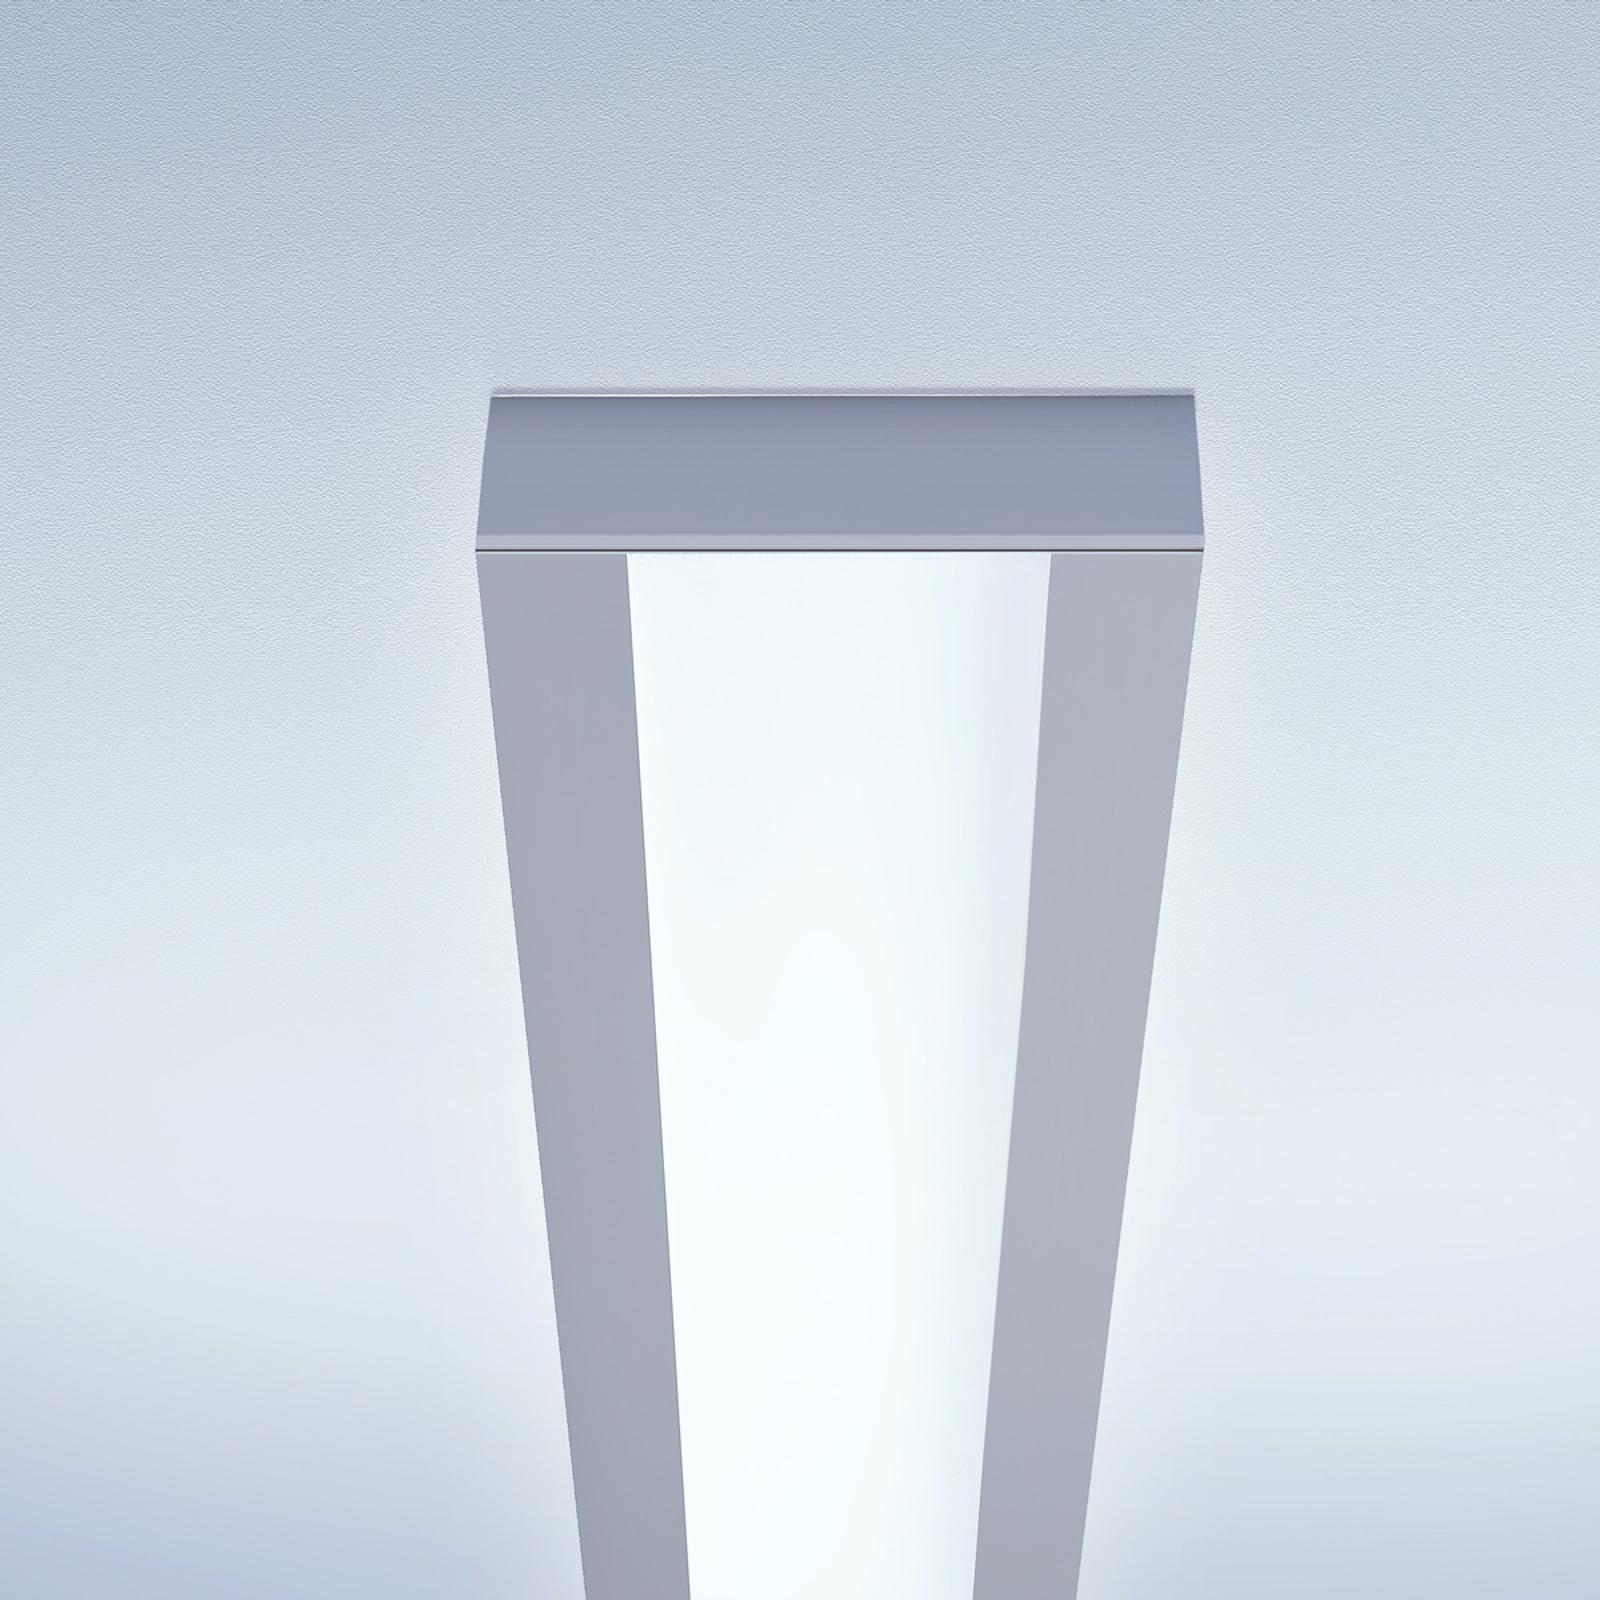 Pinta-asennuskattovalaisin LED Vison-A2 176,5 cm